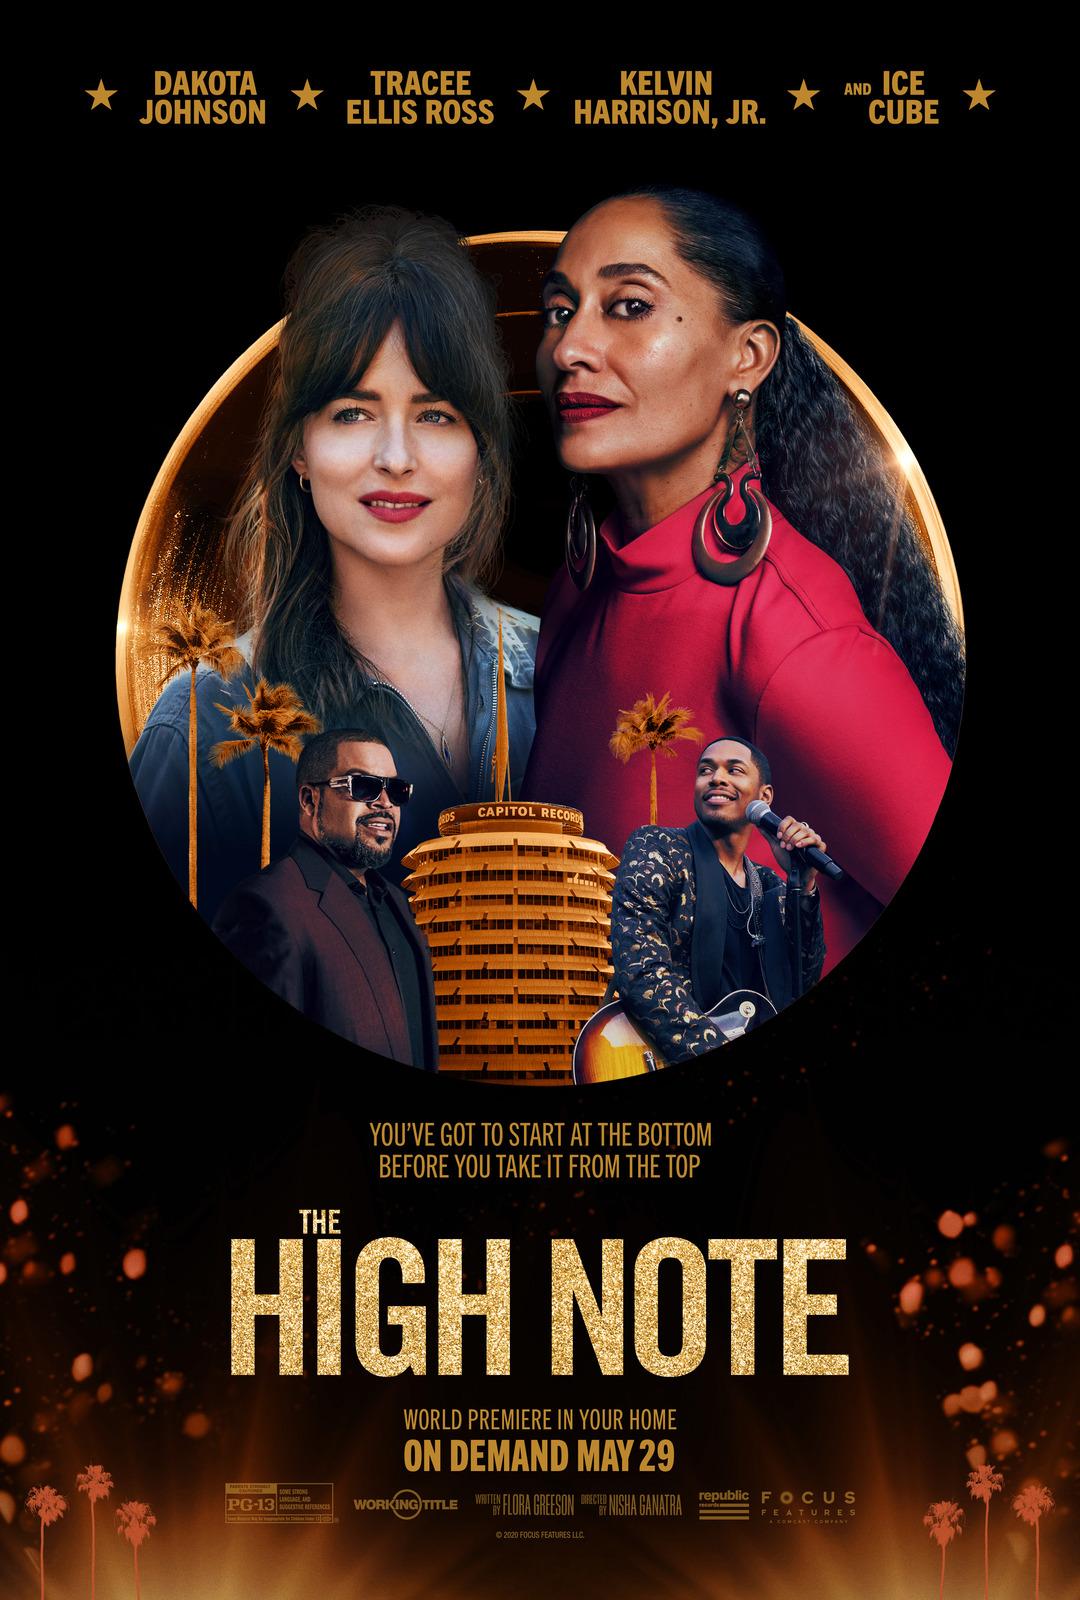 New Movie: The High Note Starring Tracee Ellis Ross & Dakota Johnson